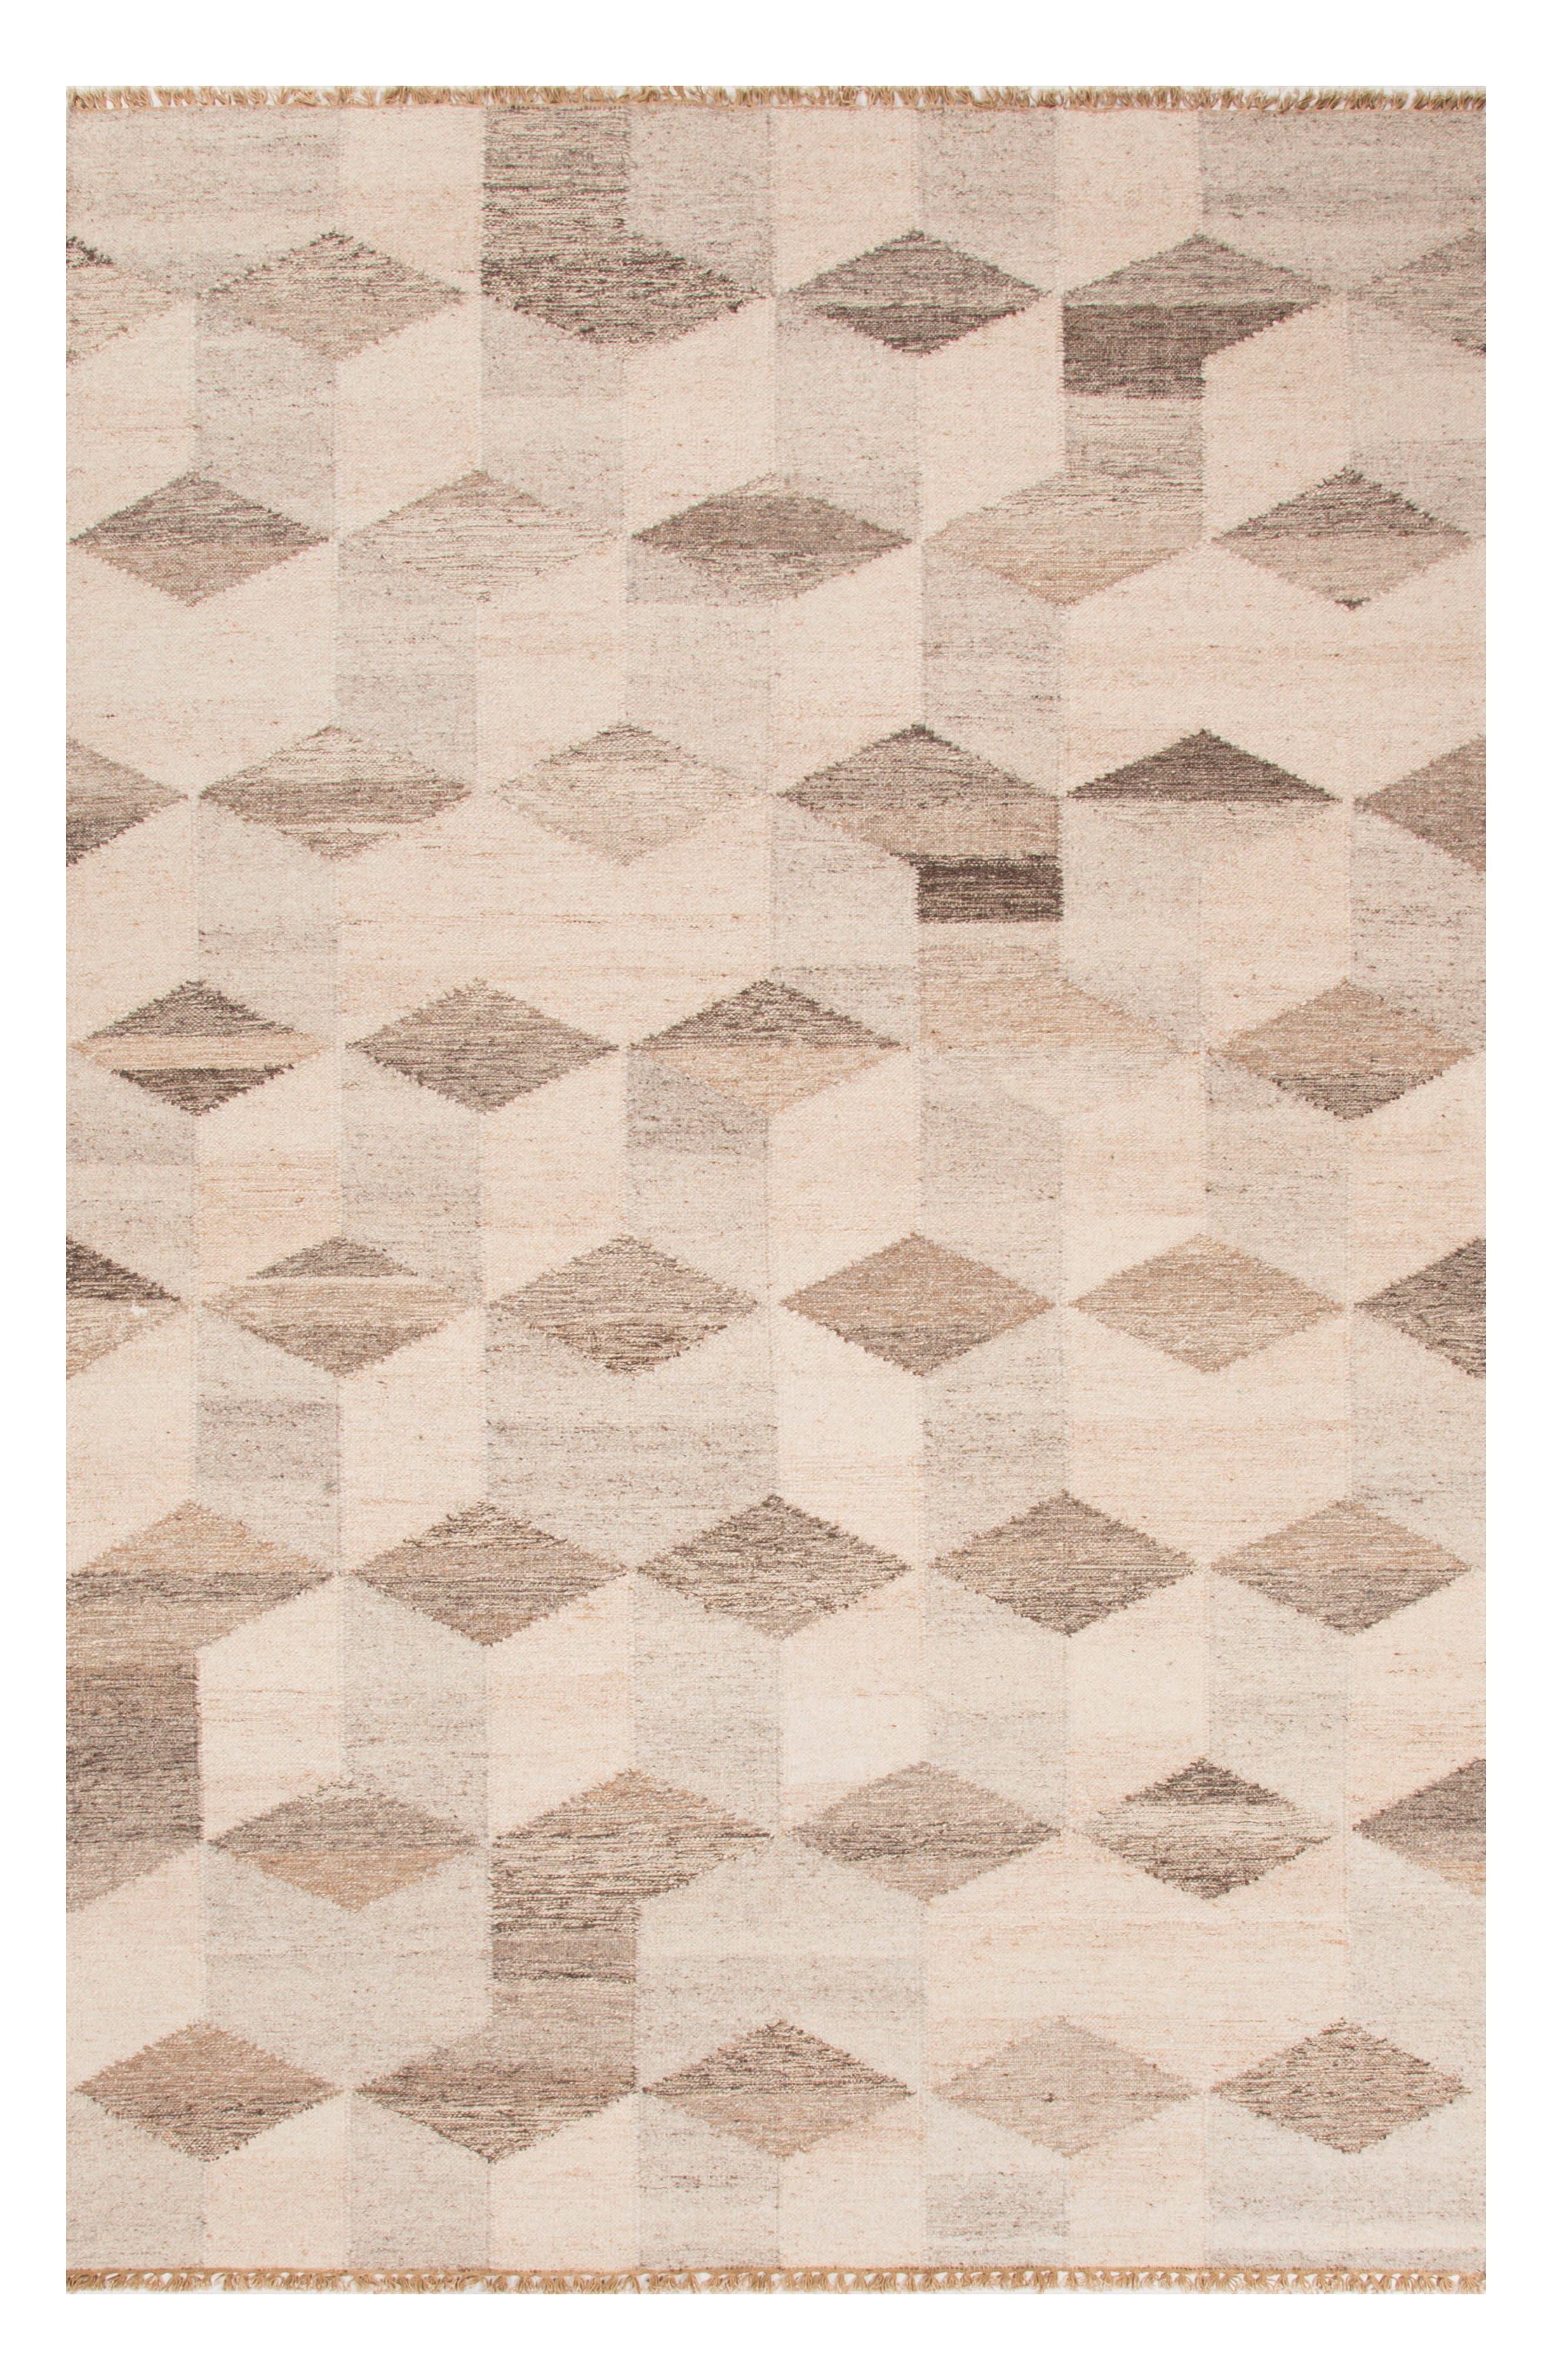 Alternate Image 1 Selected - Jaipur Pyramid Blocks Wool Rug